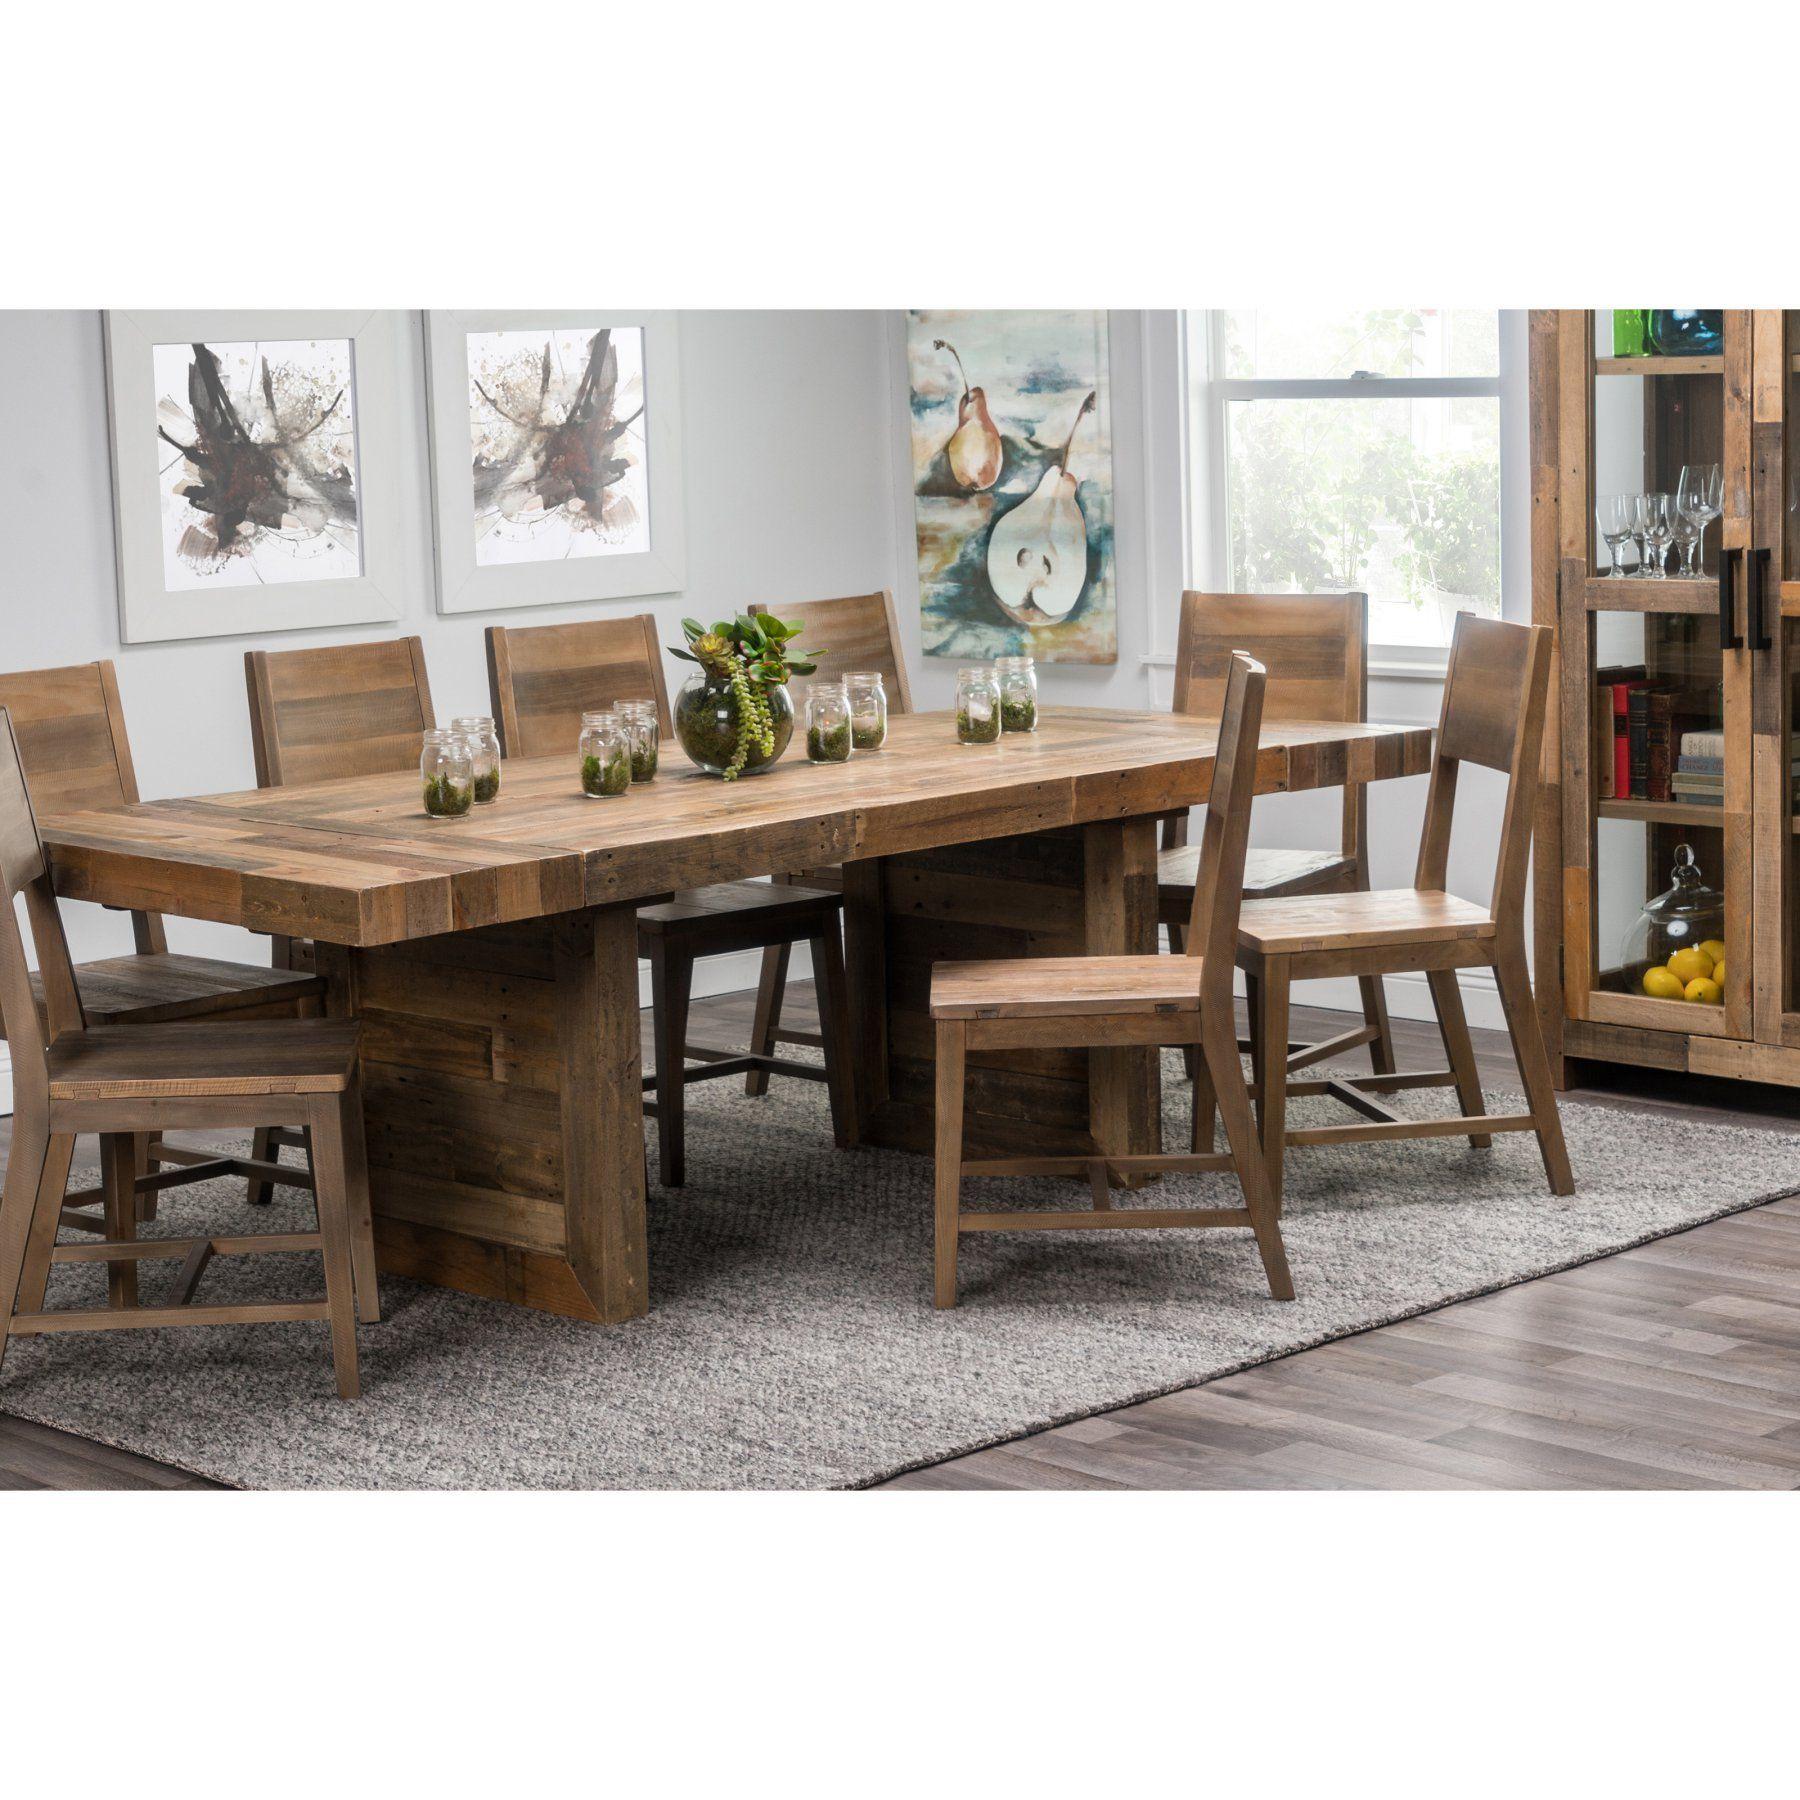 Kosas Home Norman Extension Rectangular Dining Table